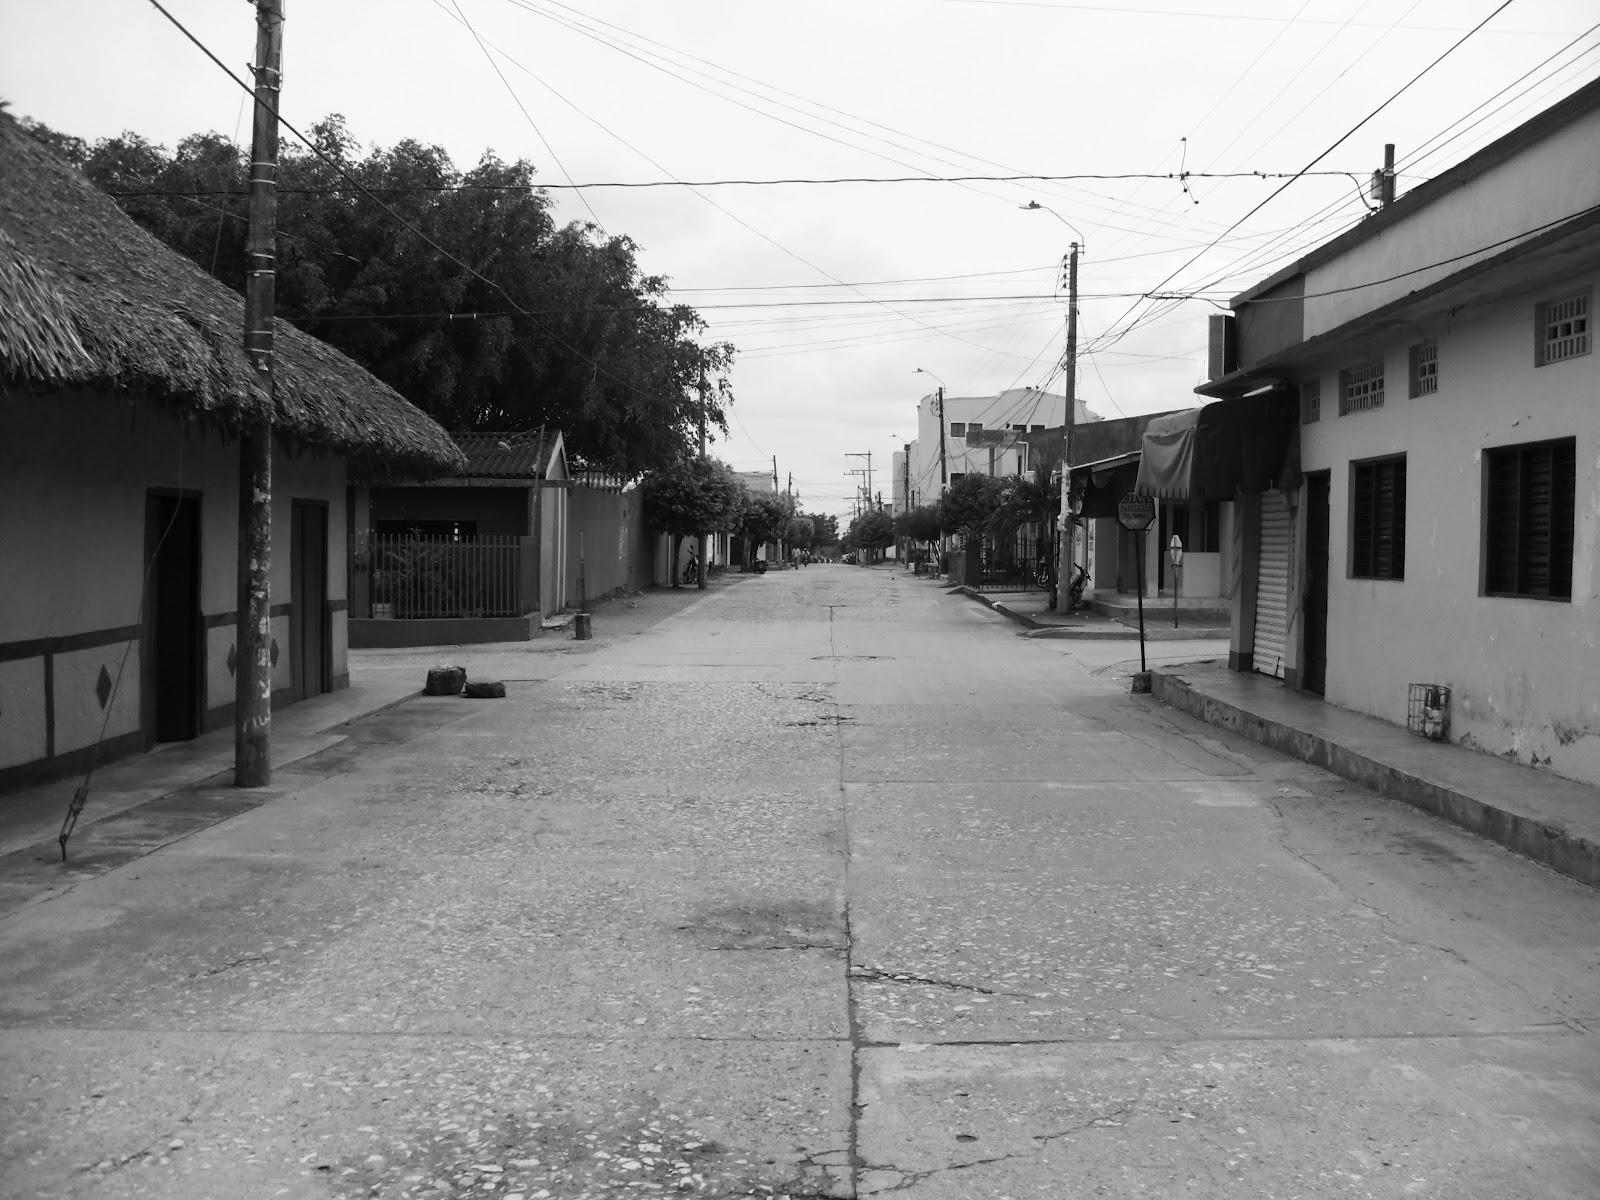 Barrio el carmen sahag n c rdoba - Calle rafael salgado ...